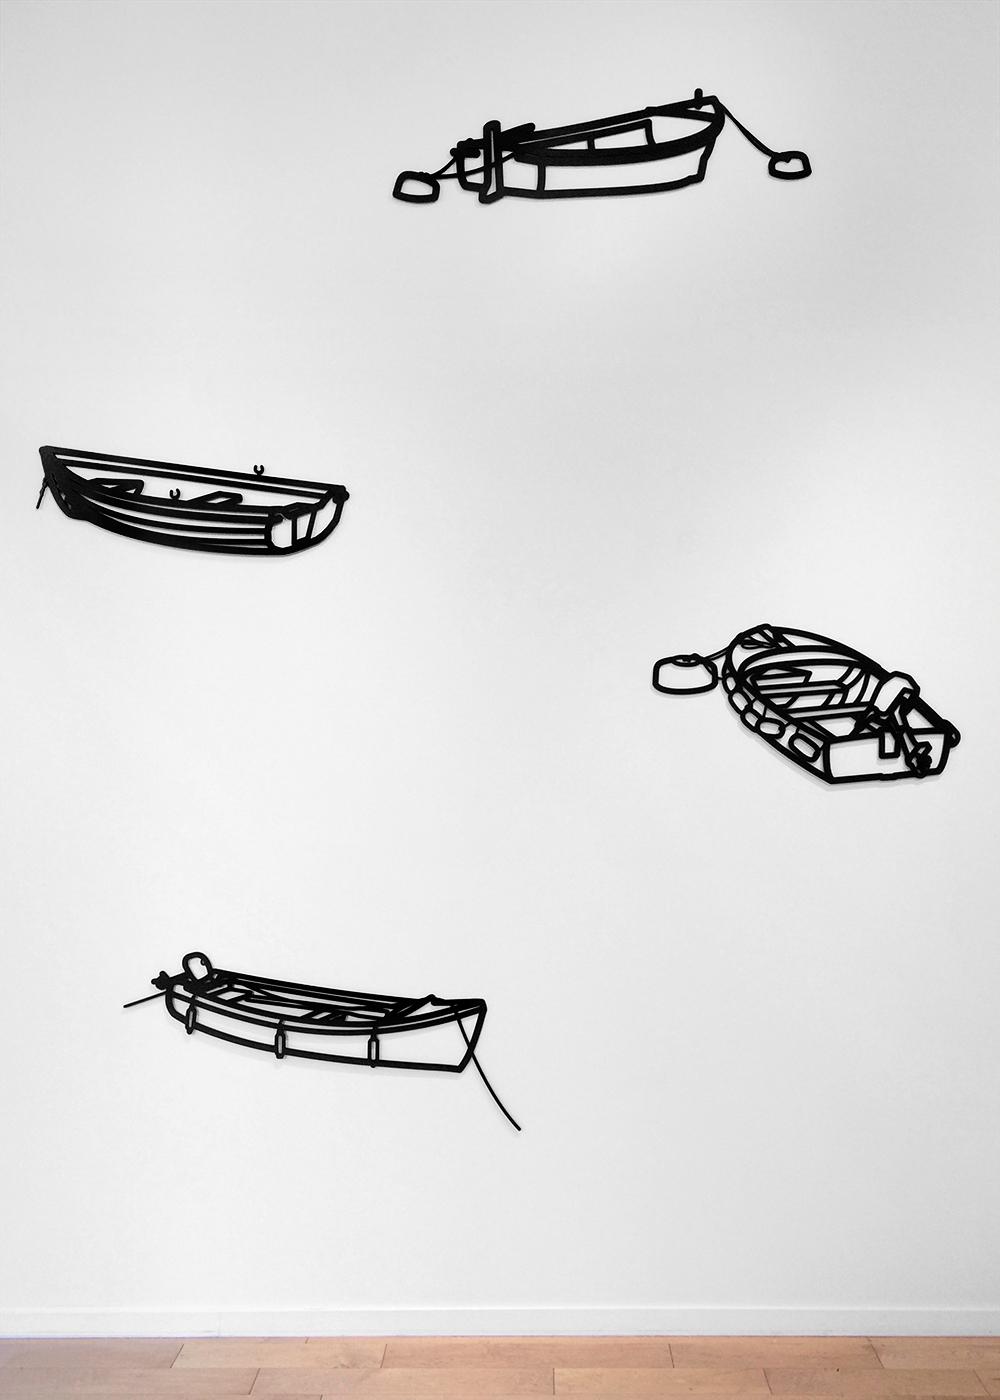 Nature 1 – Boats